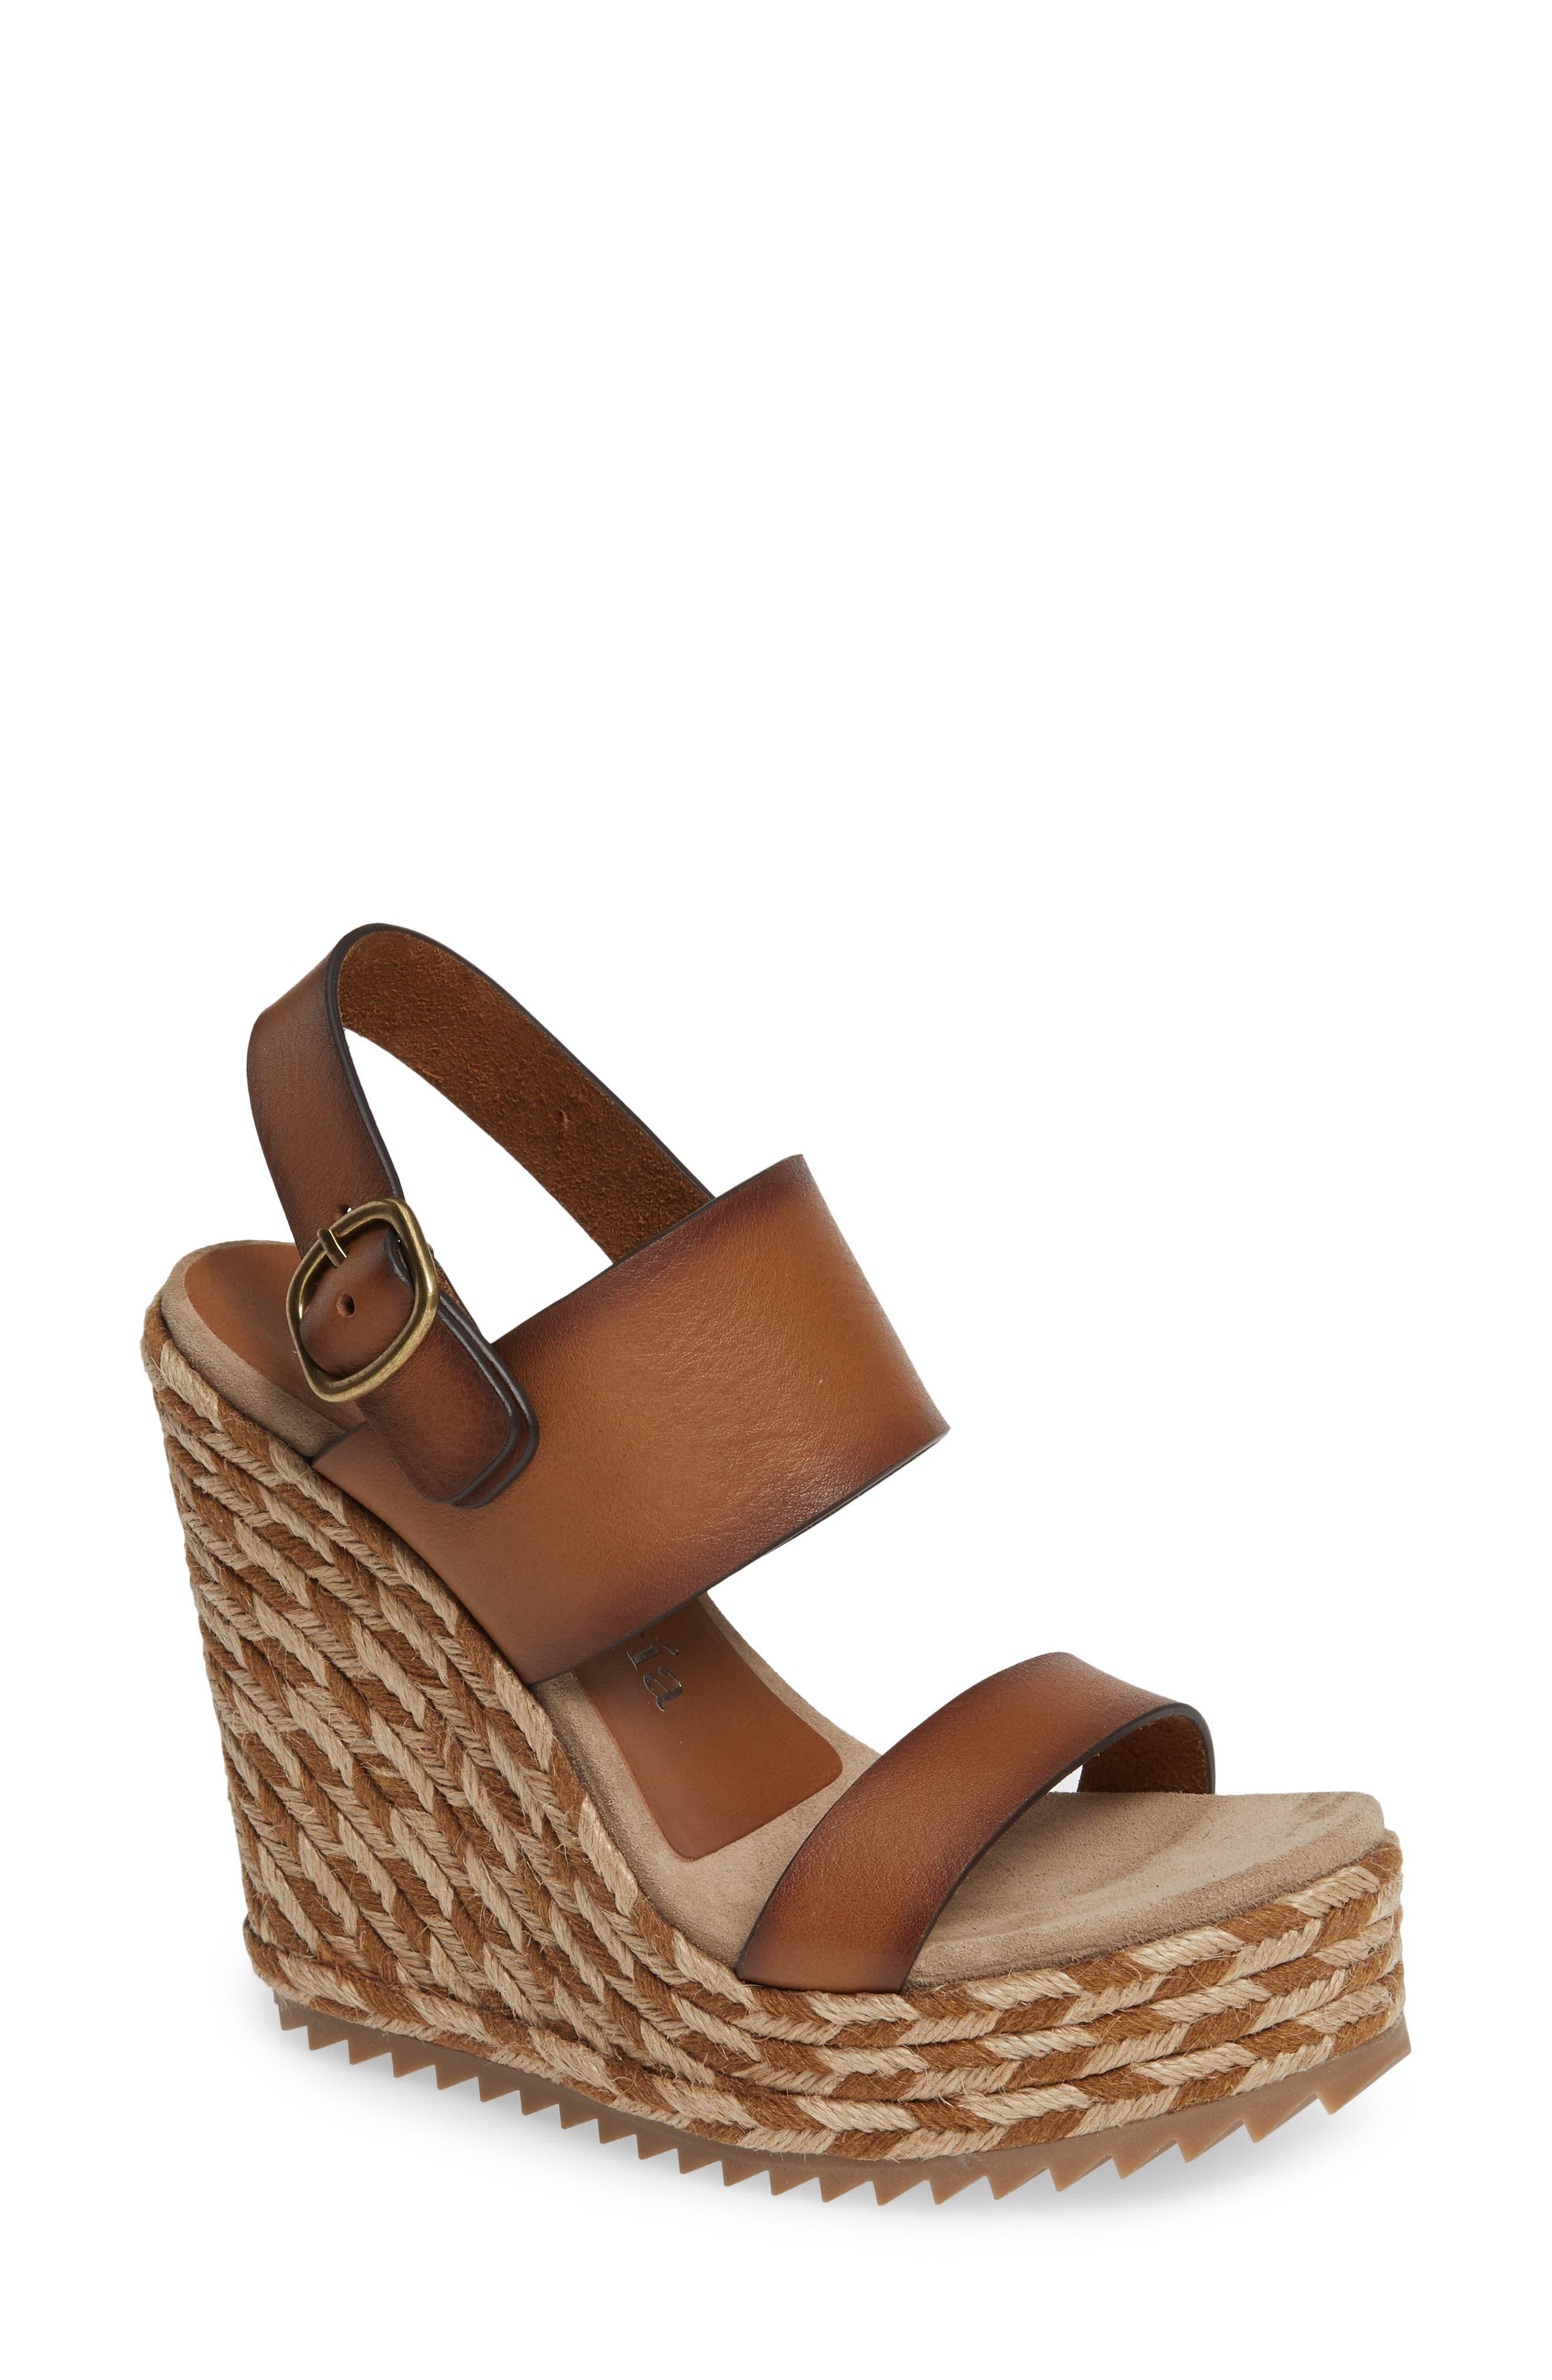 Tait Woven Wedge Sandal, Main, color, CIGAR VACCHETTA